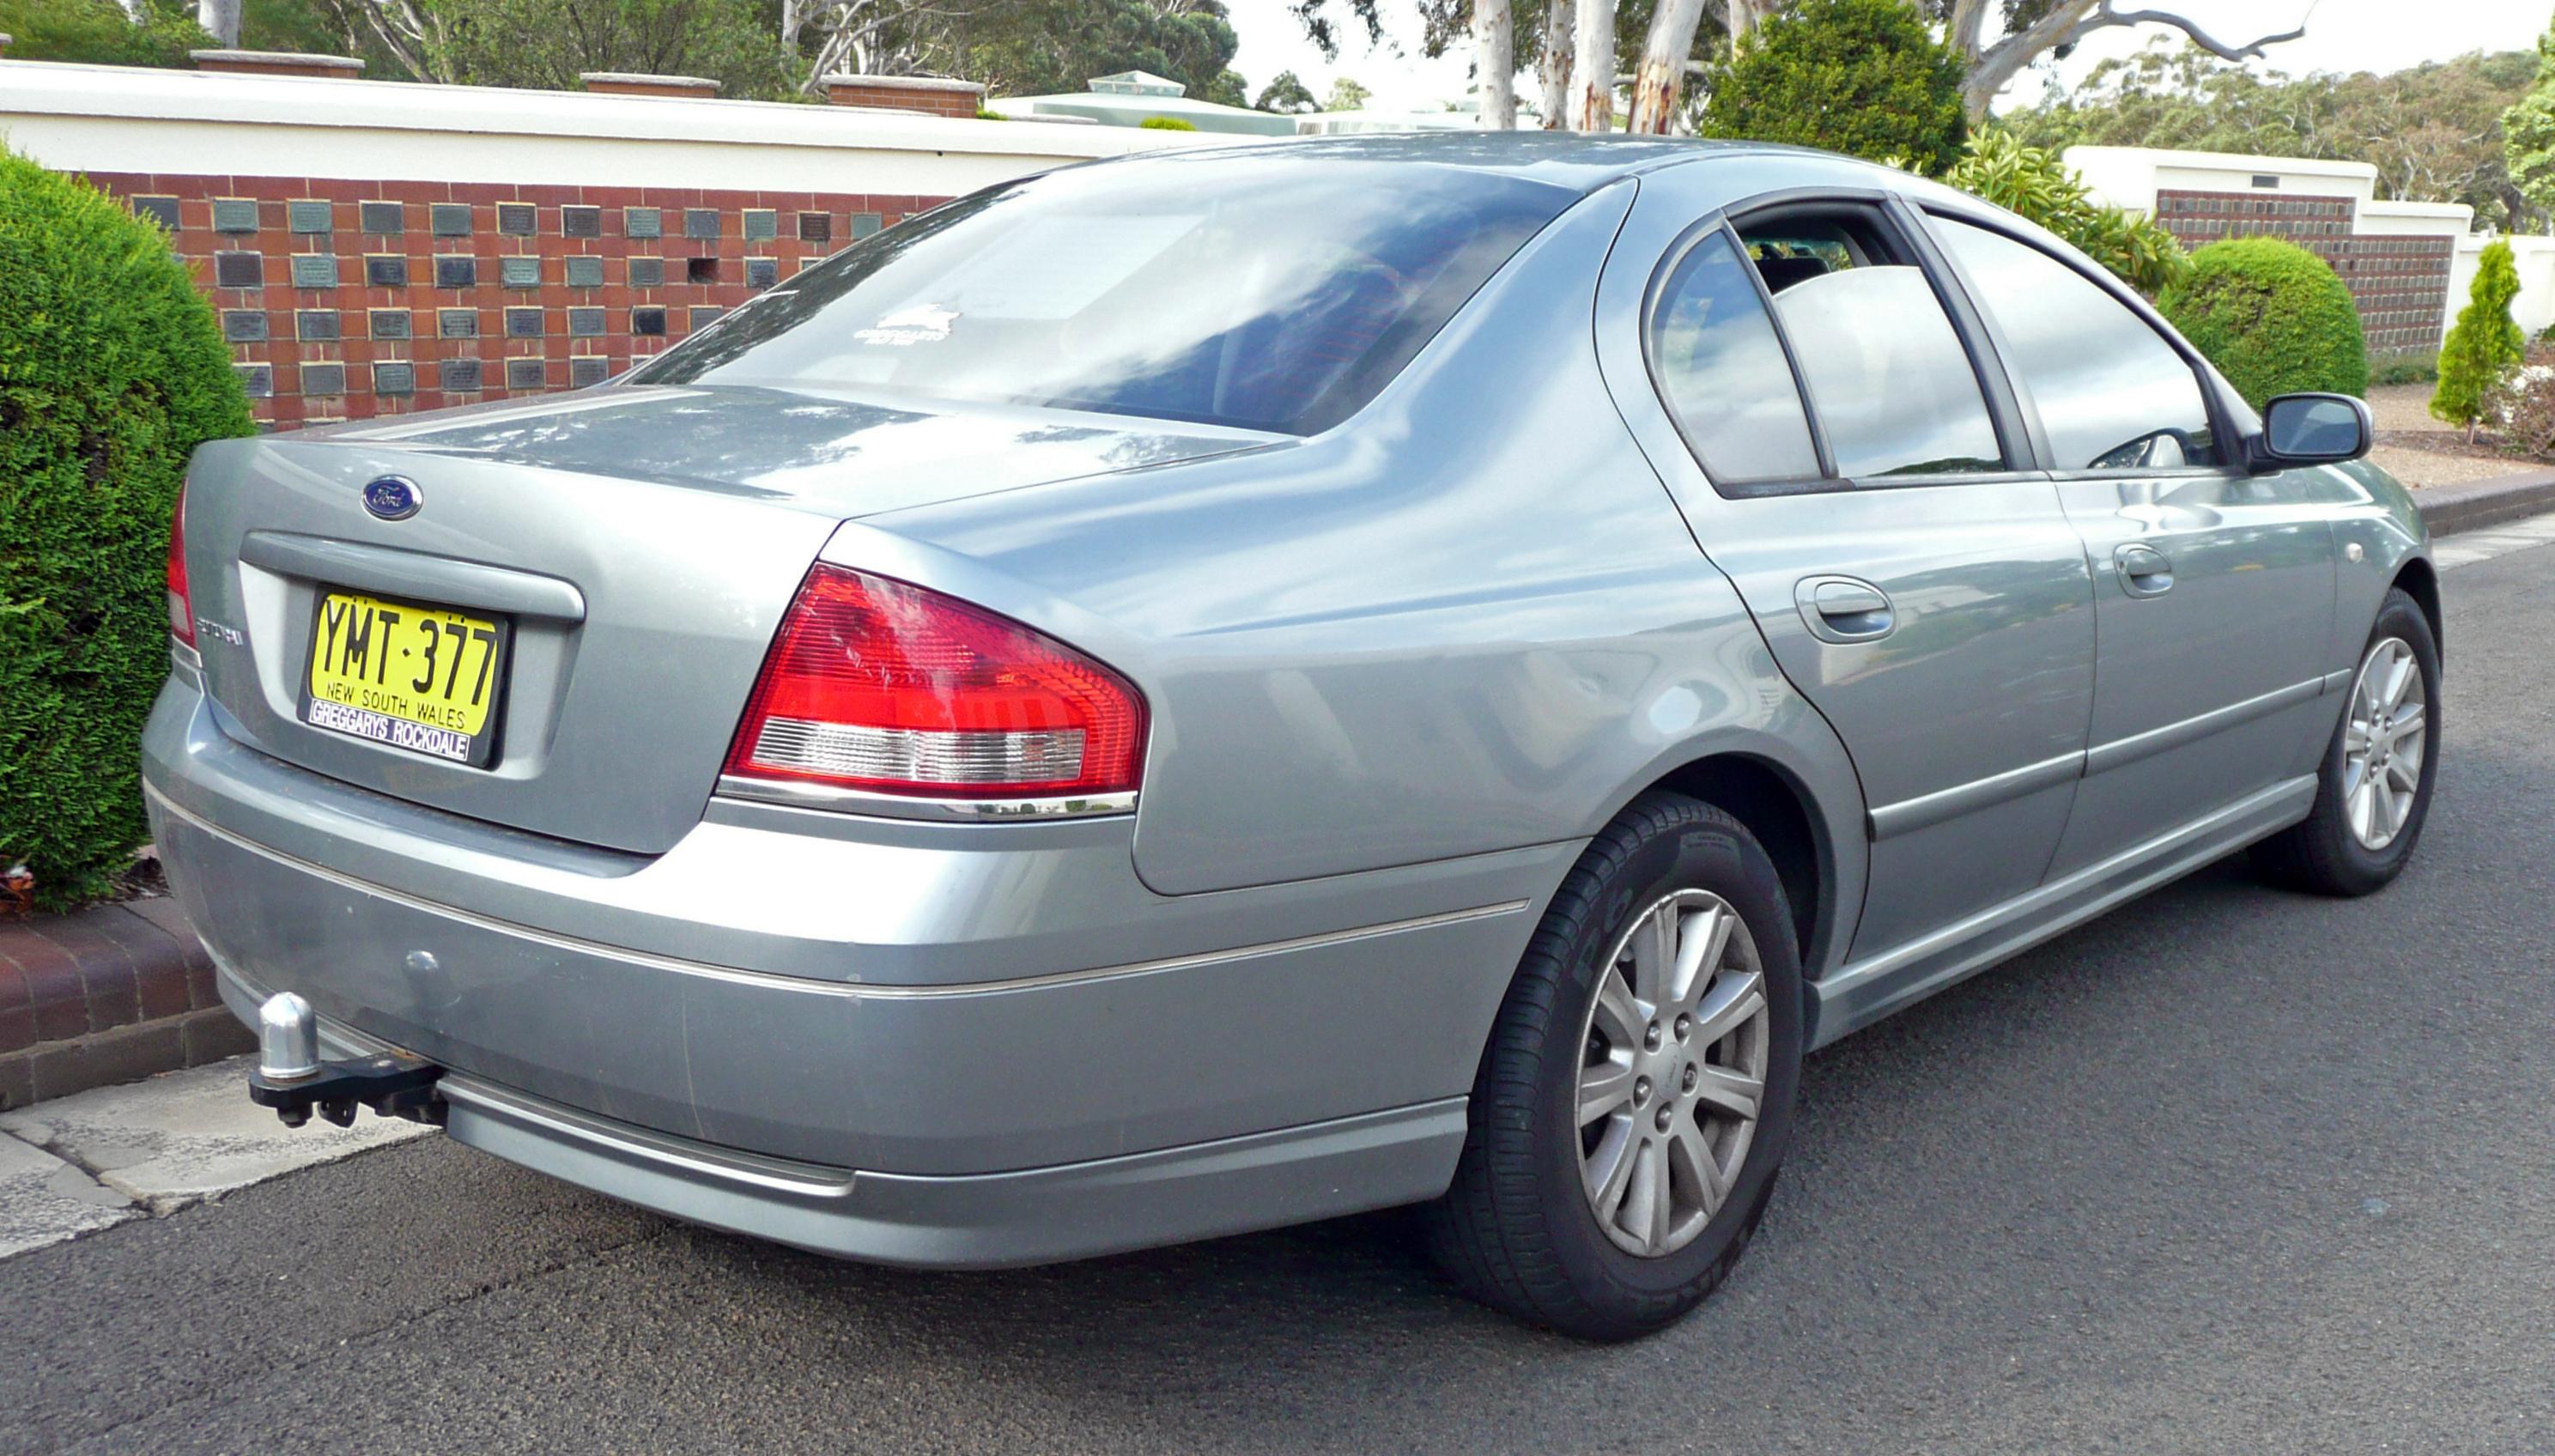 File:2003 Ford Falcon (BA) Futura sedan (2009-12-04